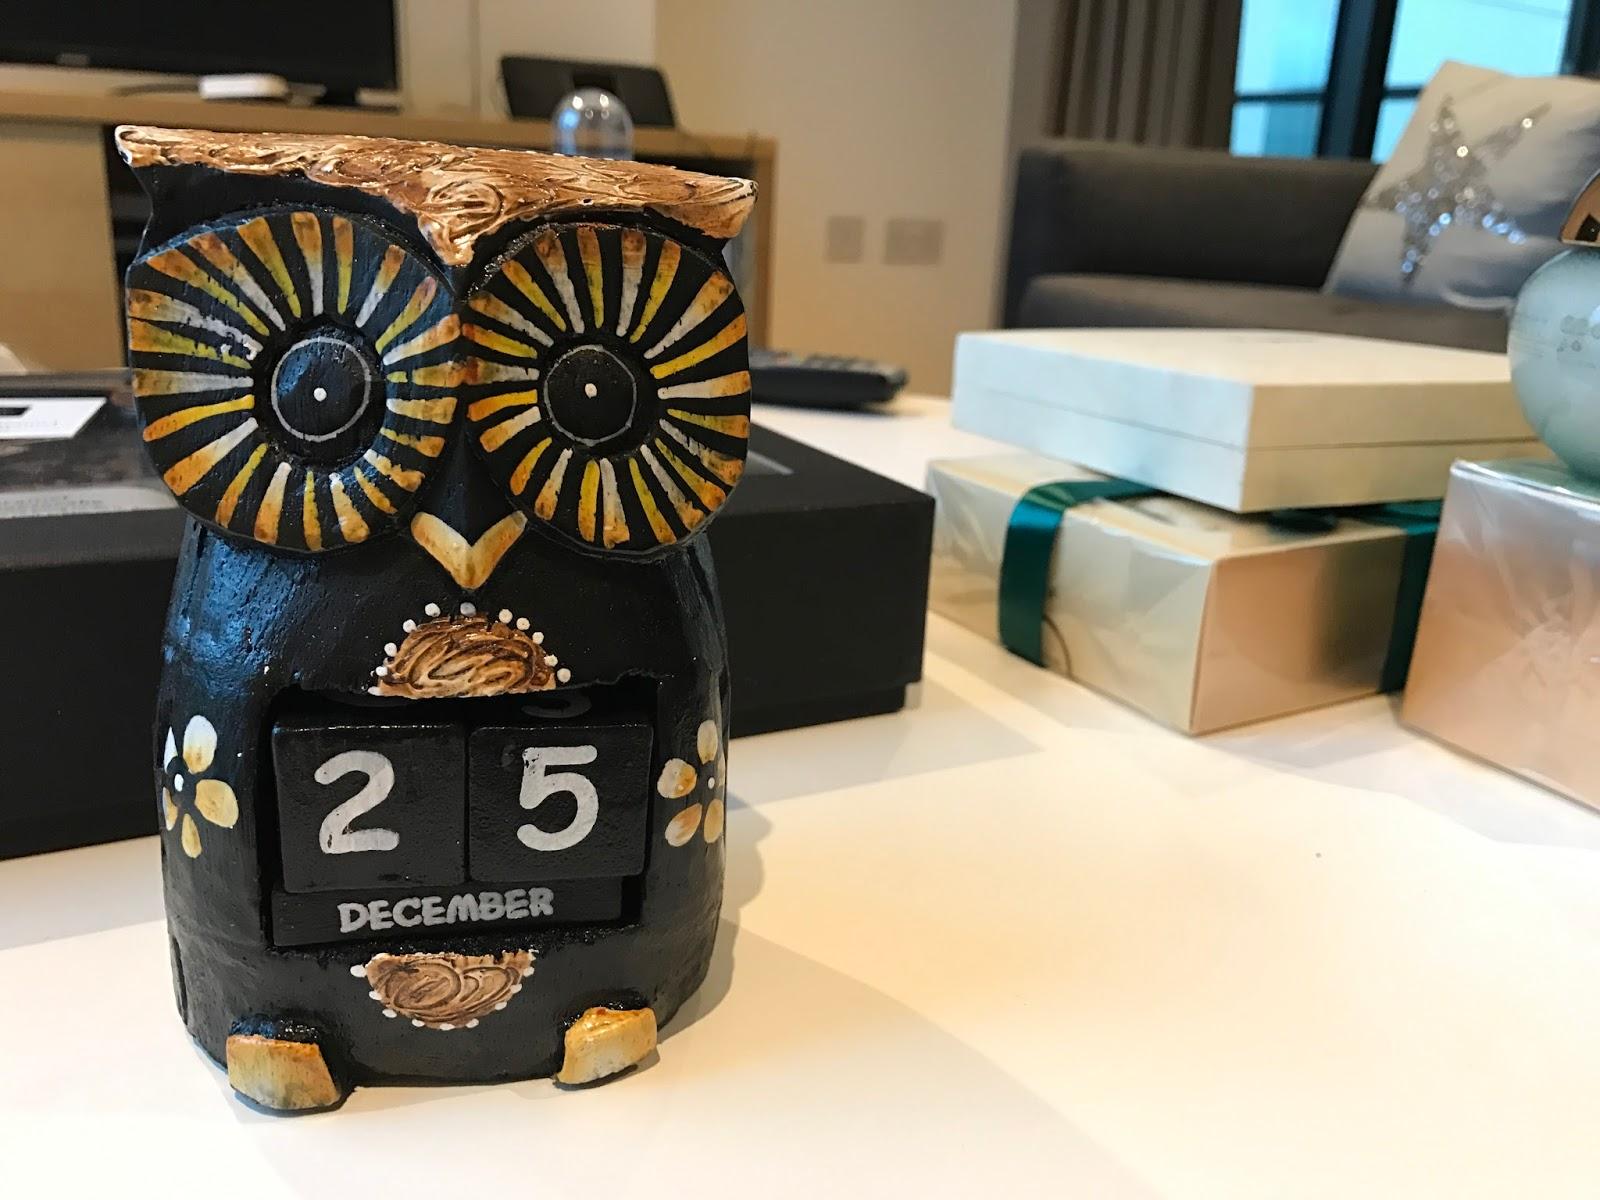 Handcrafted wooden owl calendar